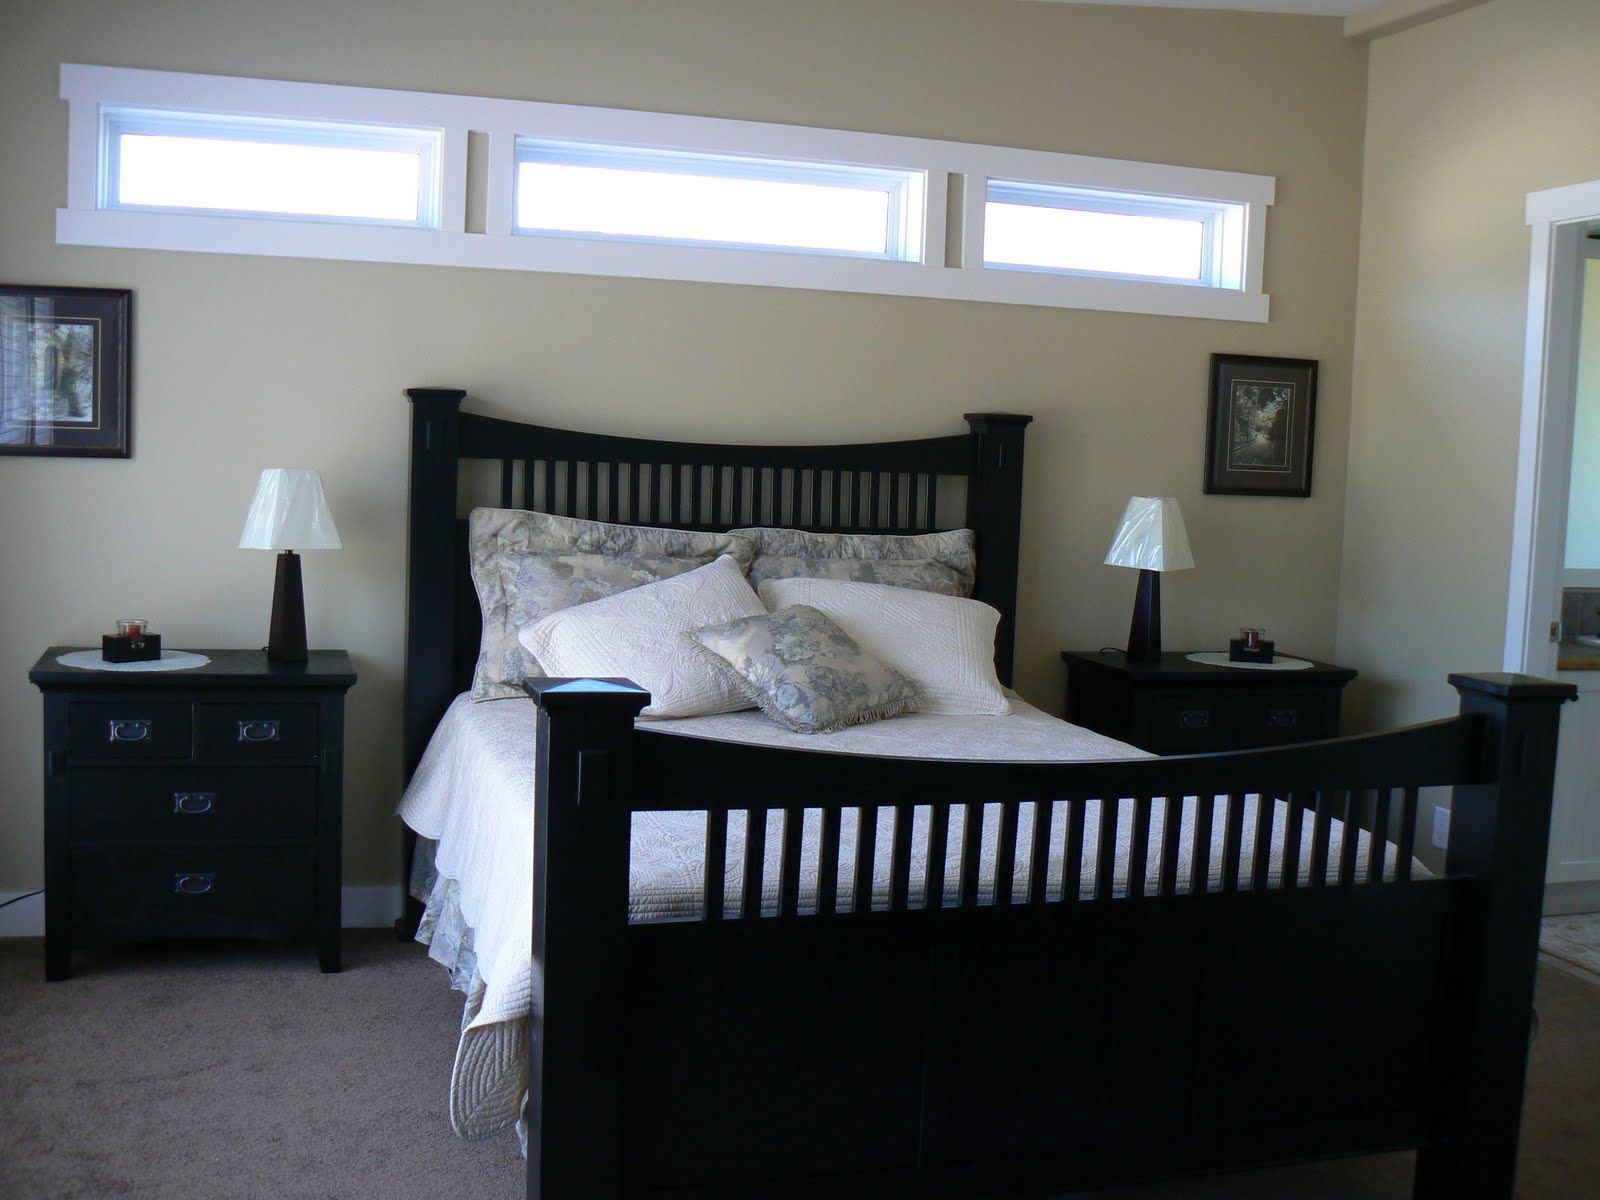 Blinds For Bedroom Windows Ideas